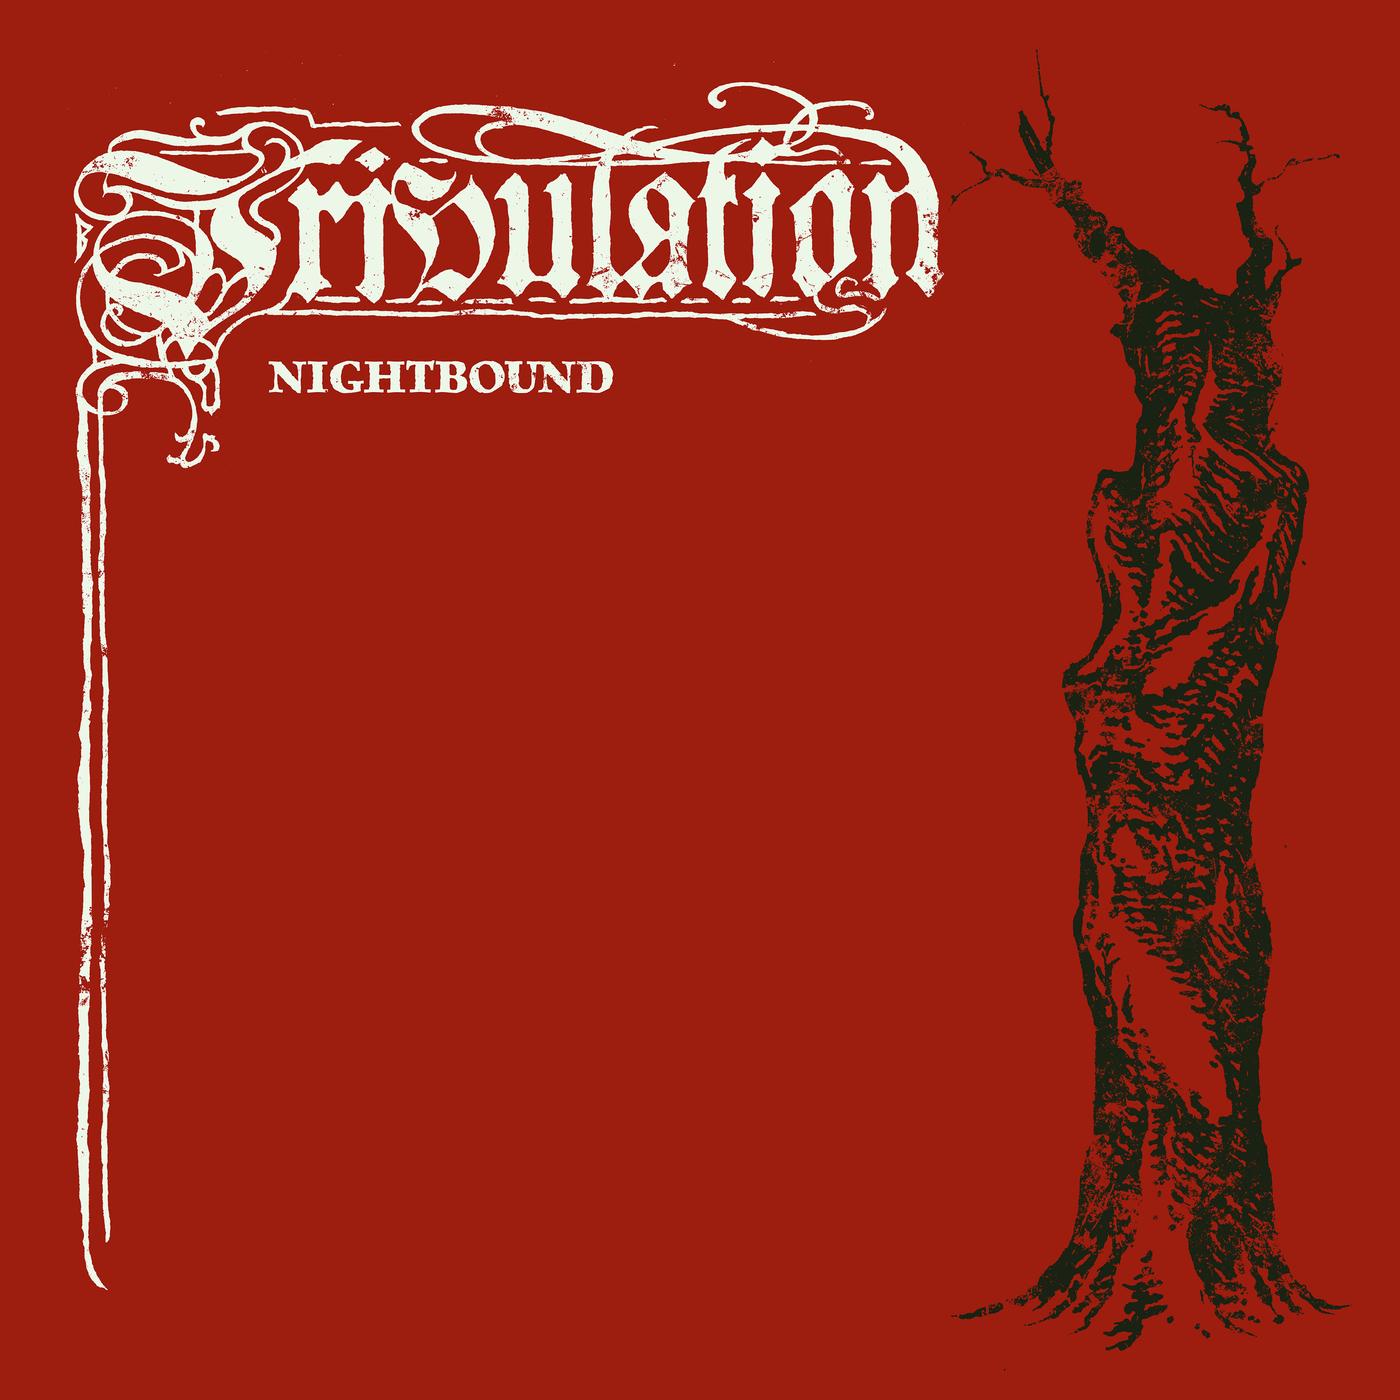 Nightbound - Tribulation